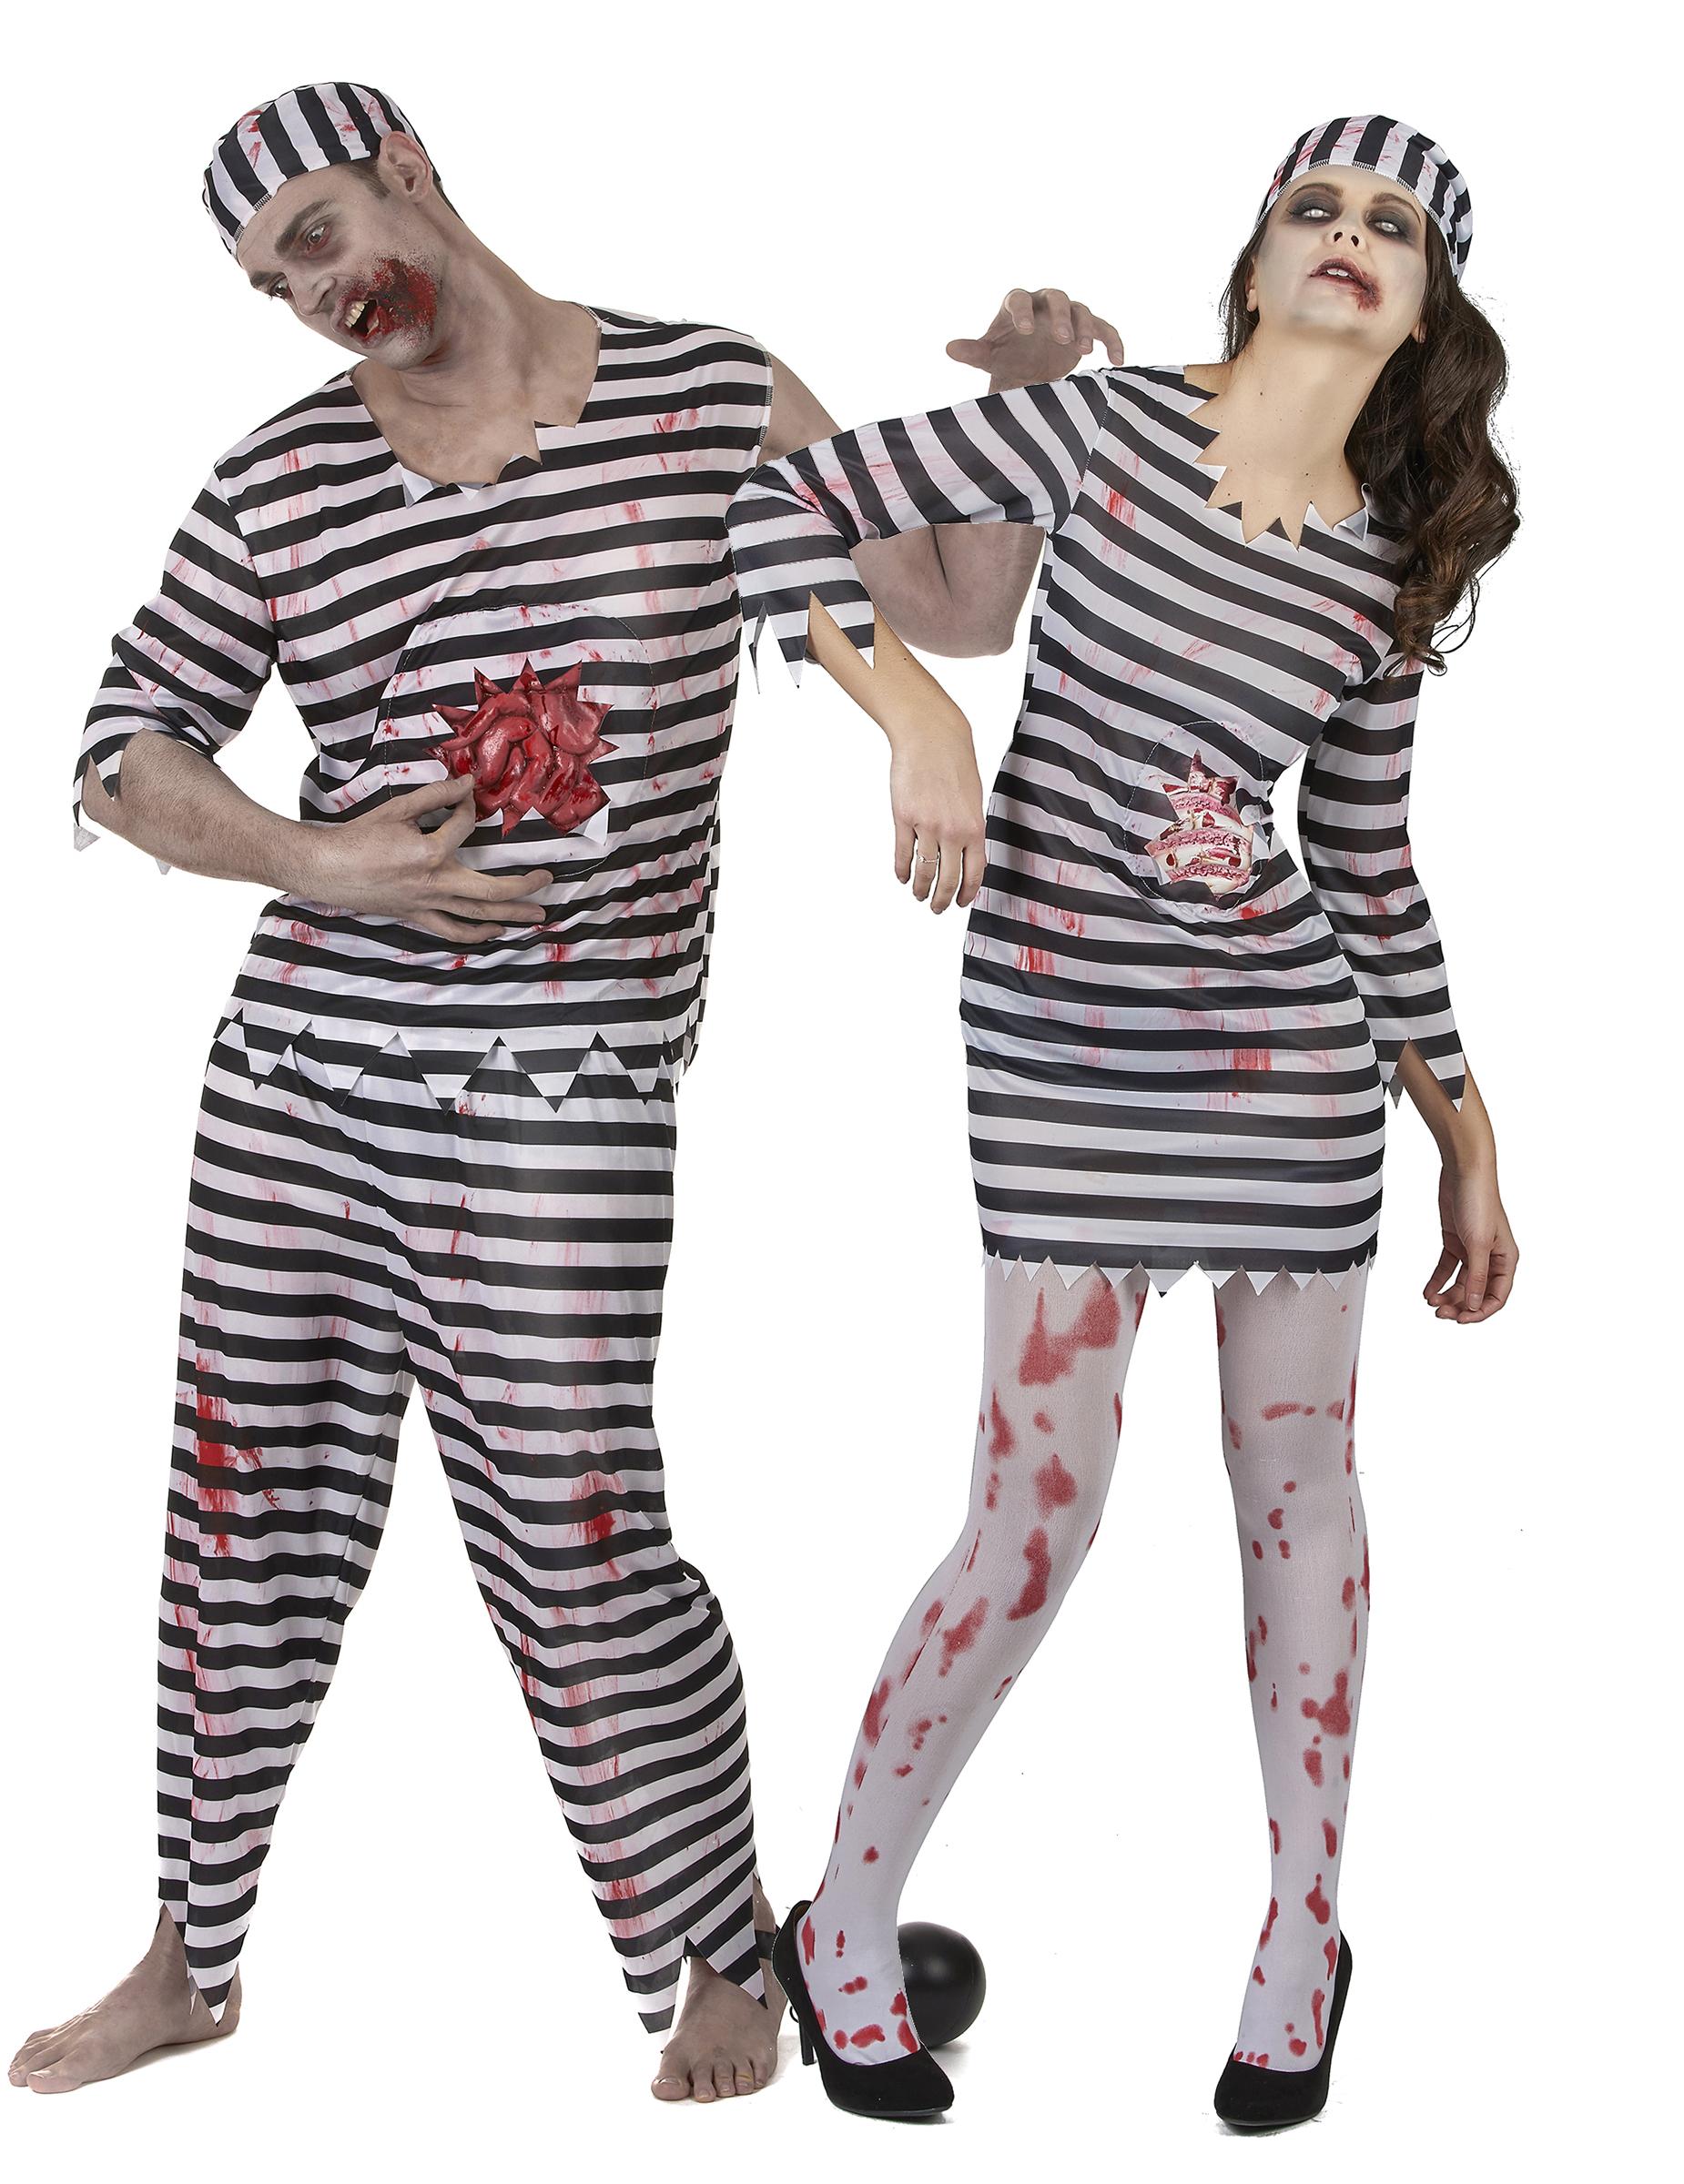 Zombie brottslingar - Halloweenkostym för par 318bab36ecb52